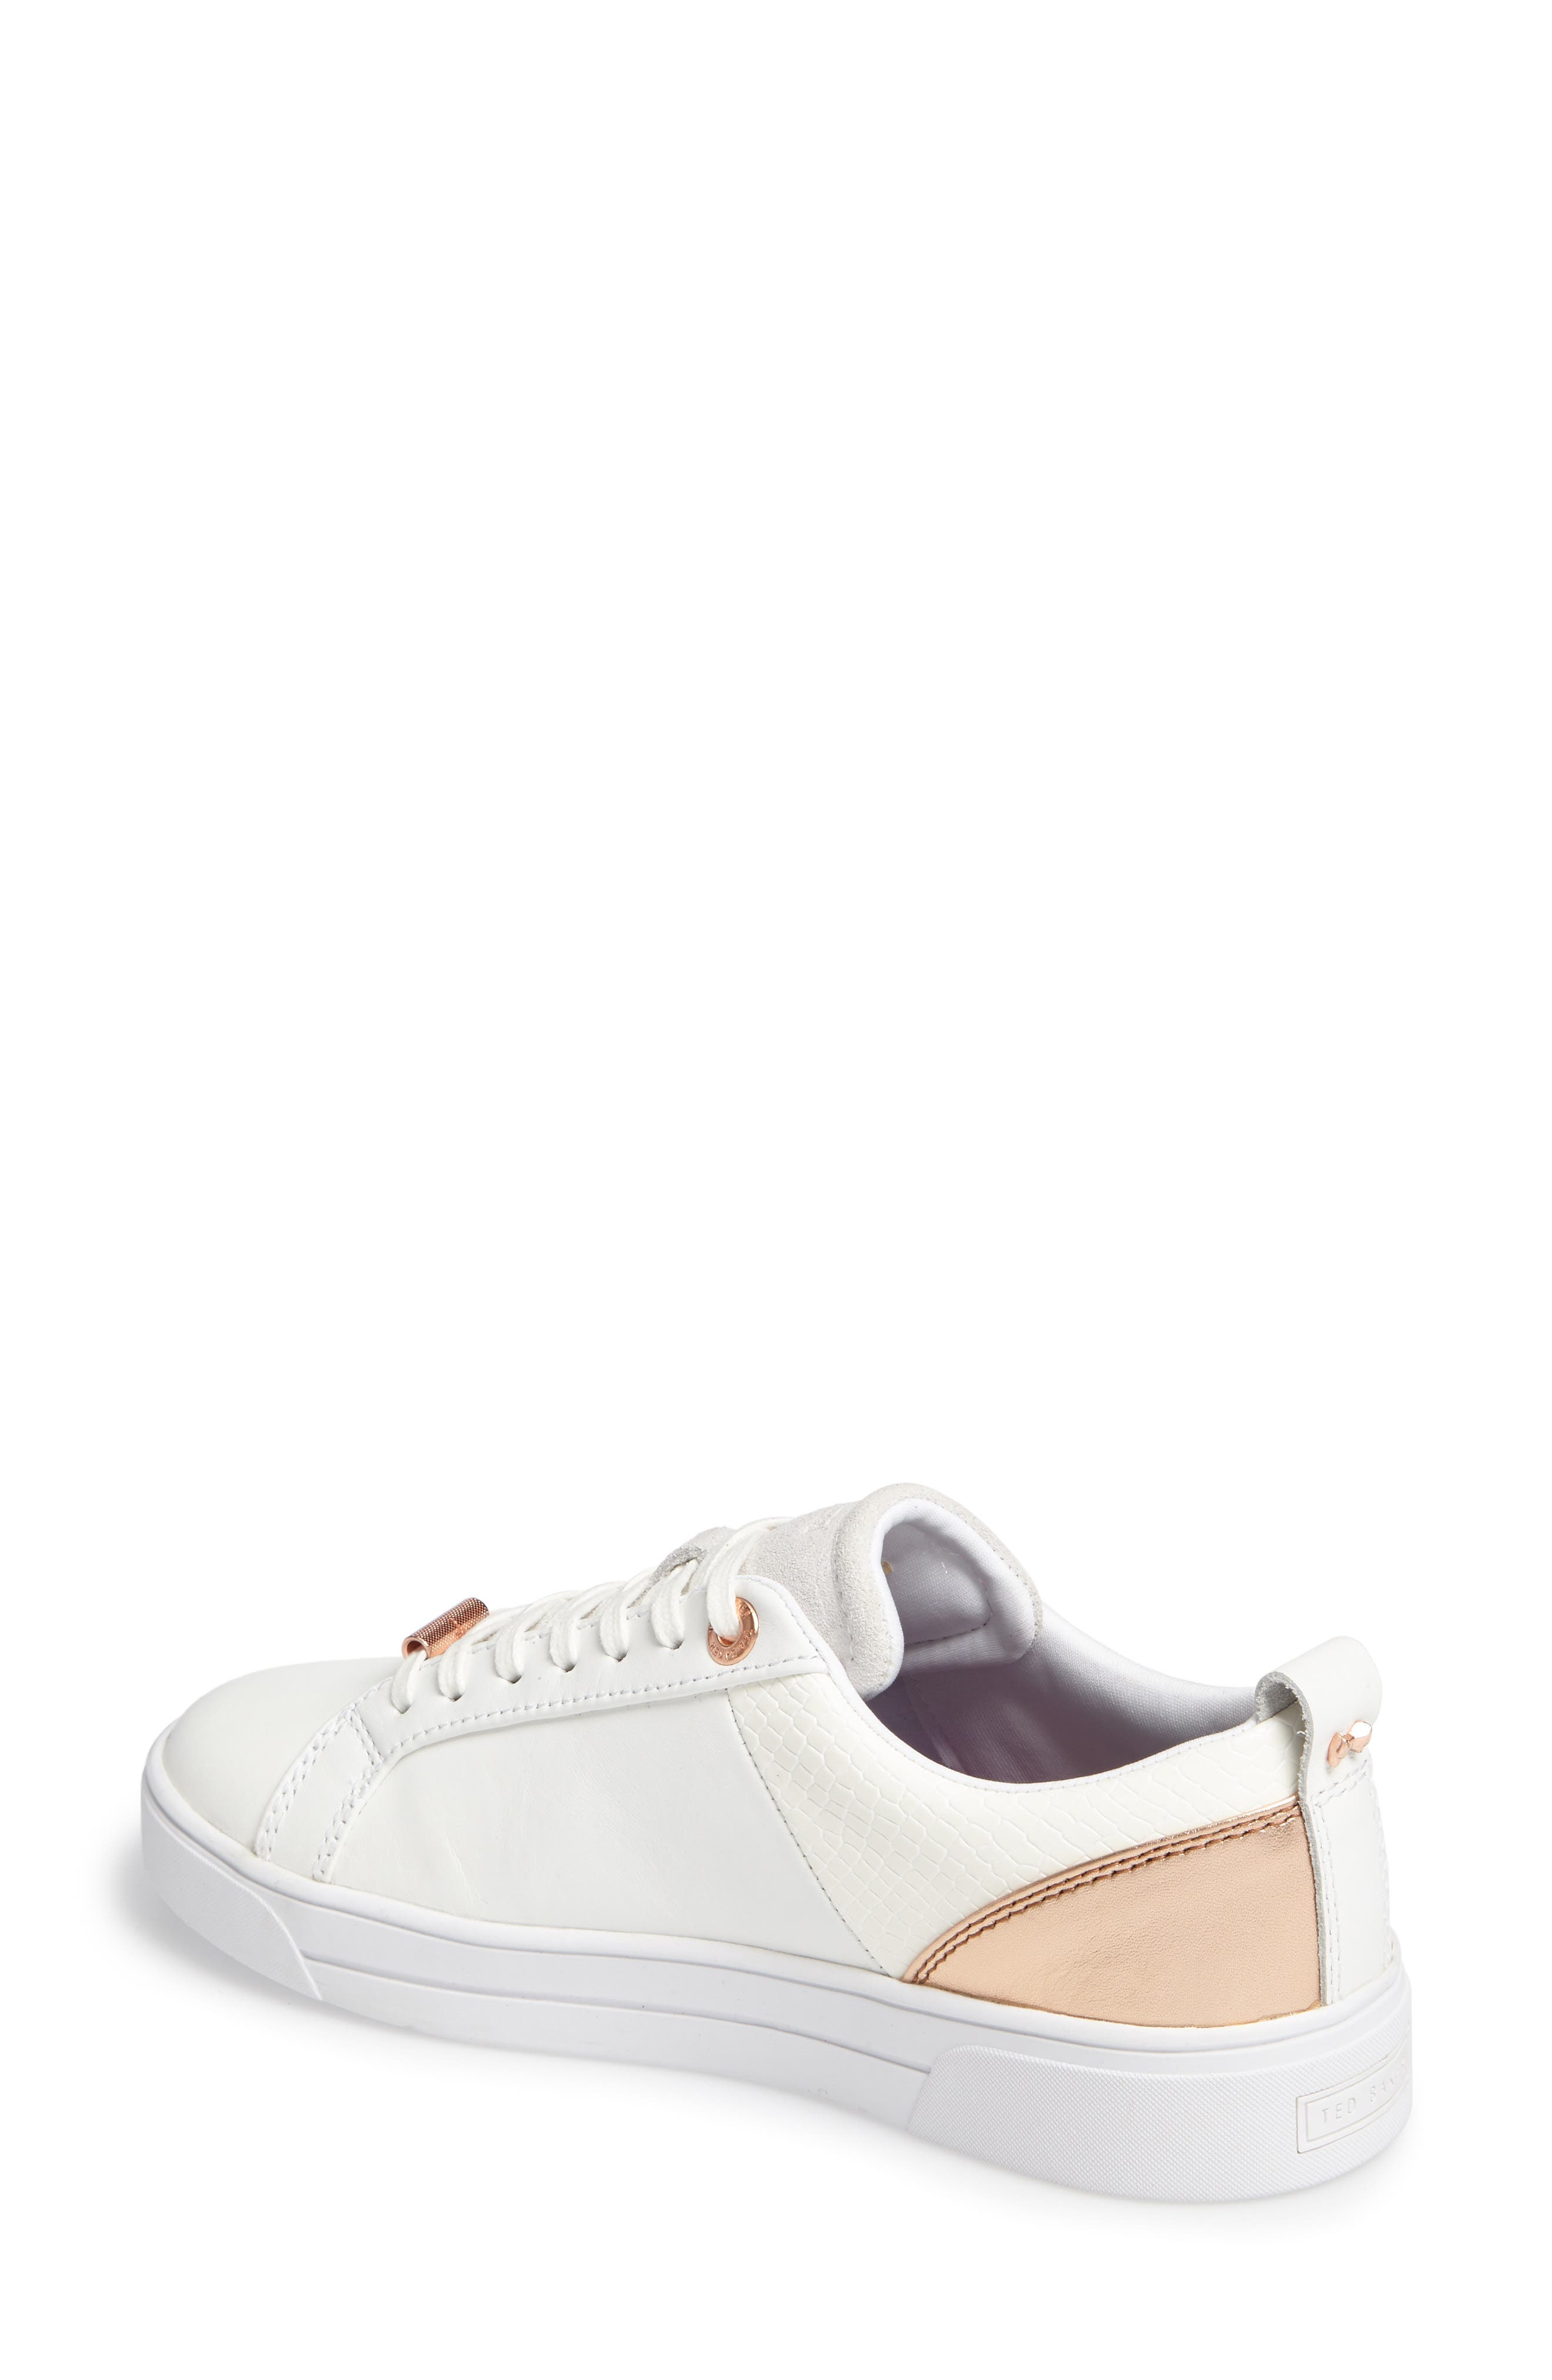 Kulei Lace-Up Sneaker,                             Alternate thumbnail 2, color,                             112